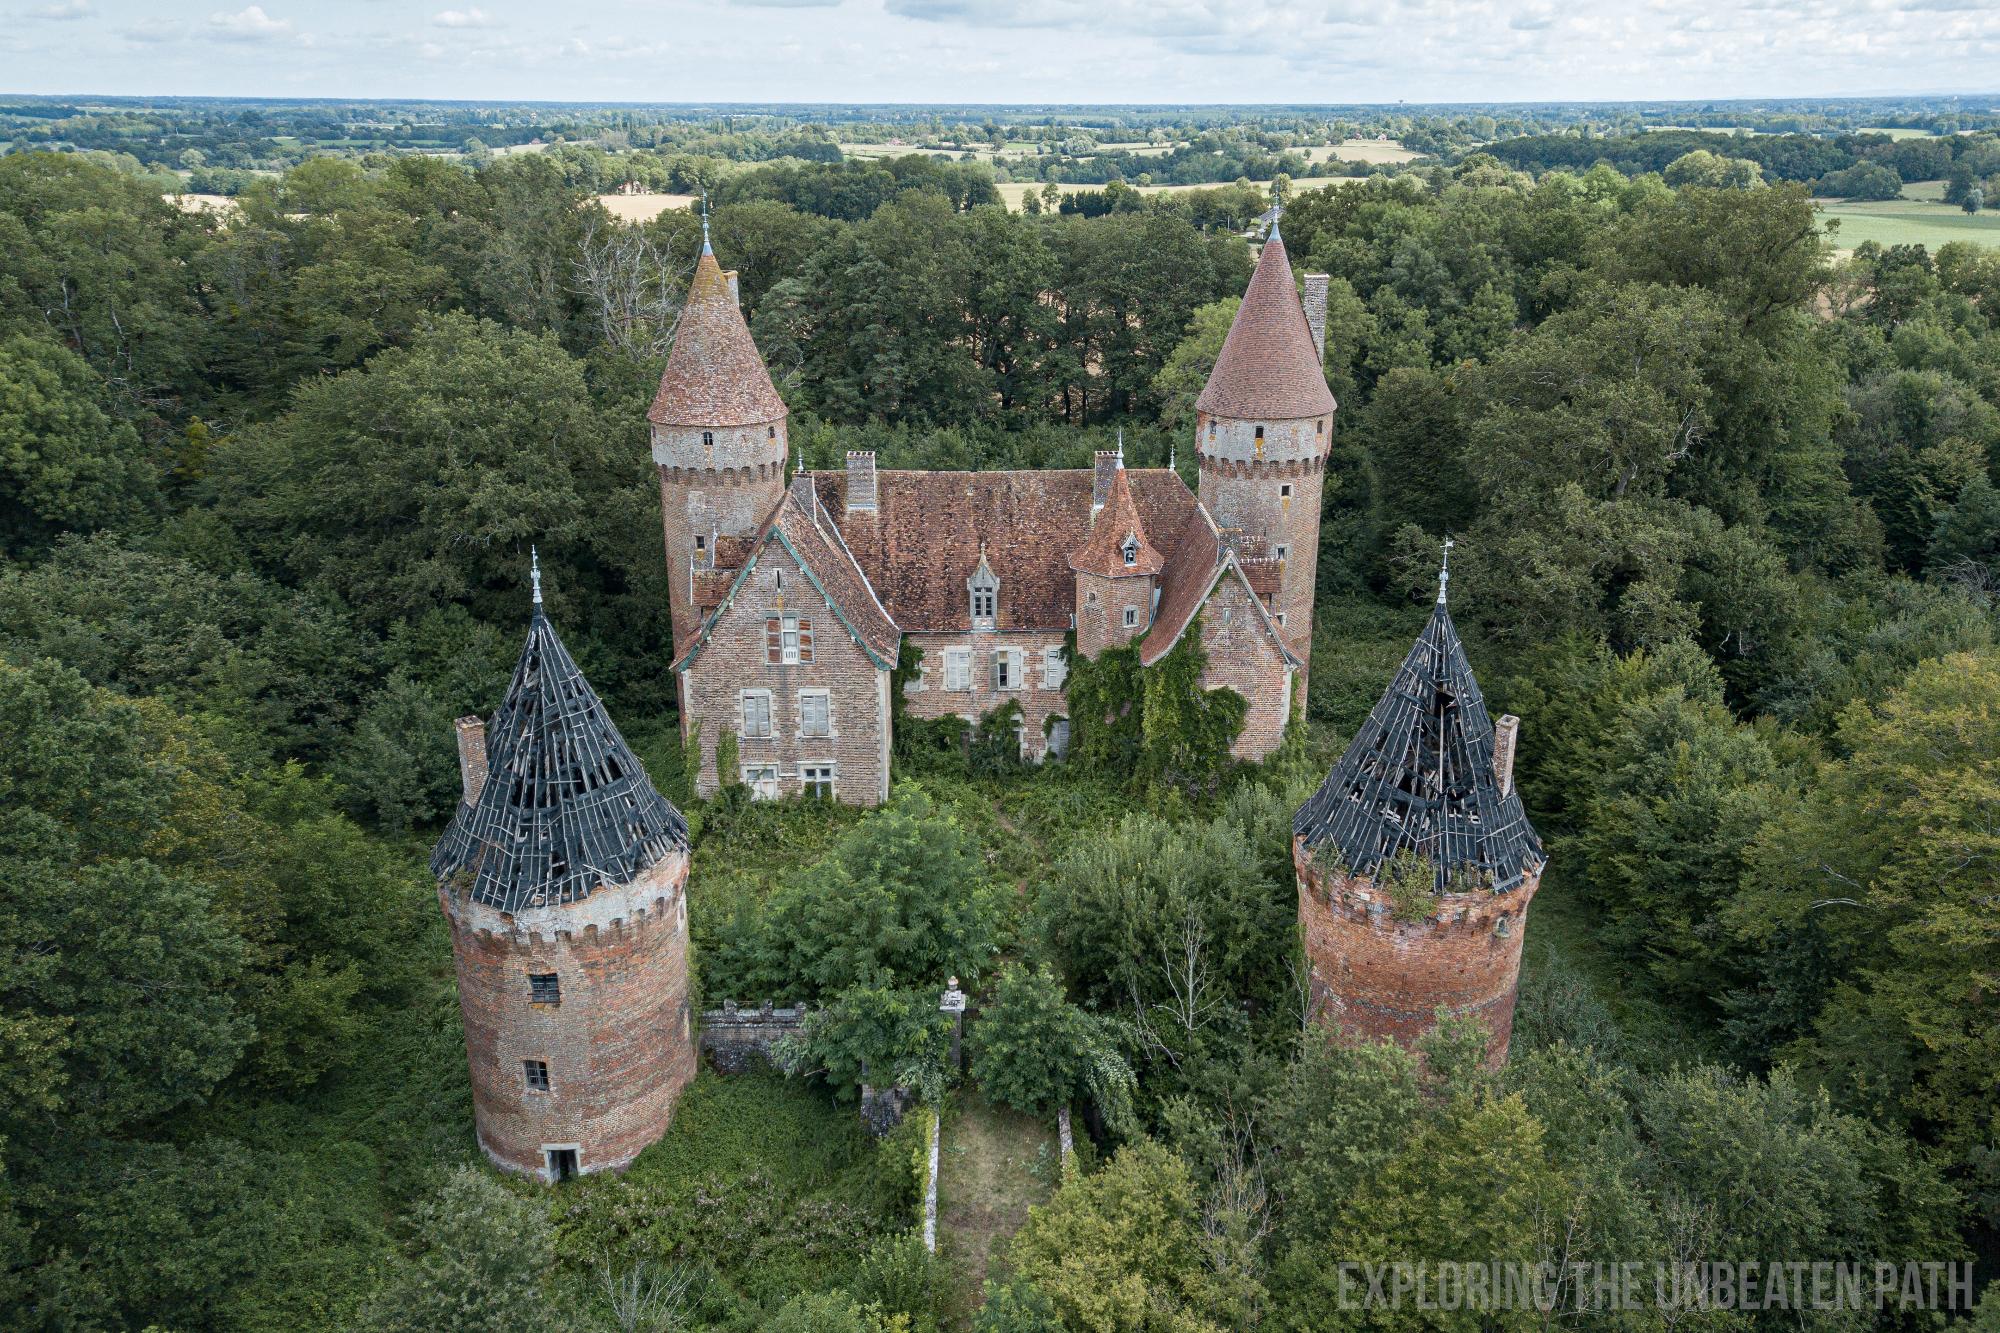 Abandoned Castle France Urbex